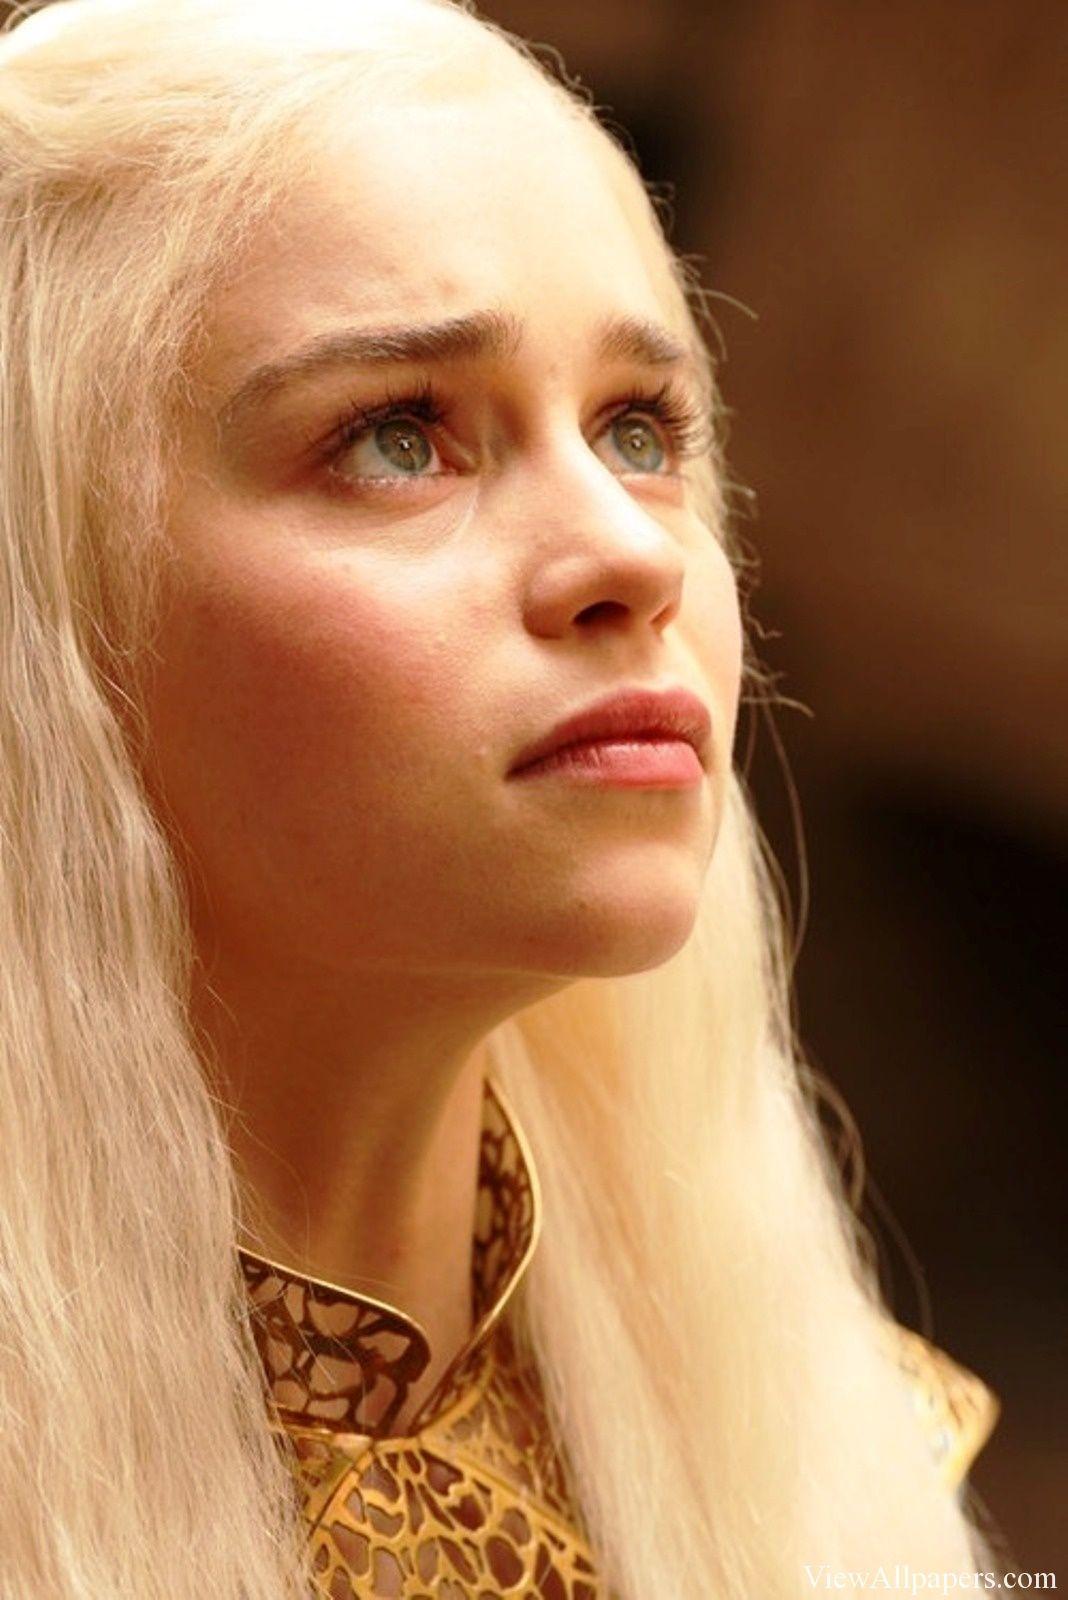 Emilia Clarke Game Of Thrones Wallpaper Beau Visage Game Of